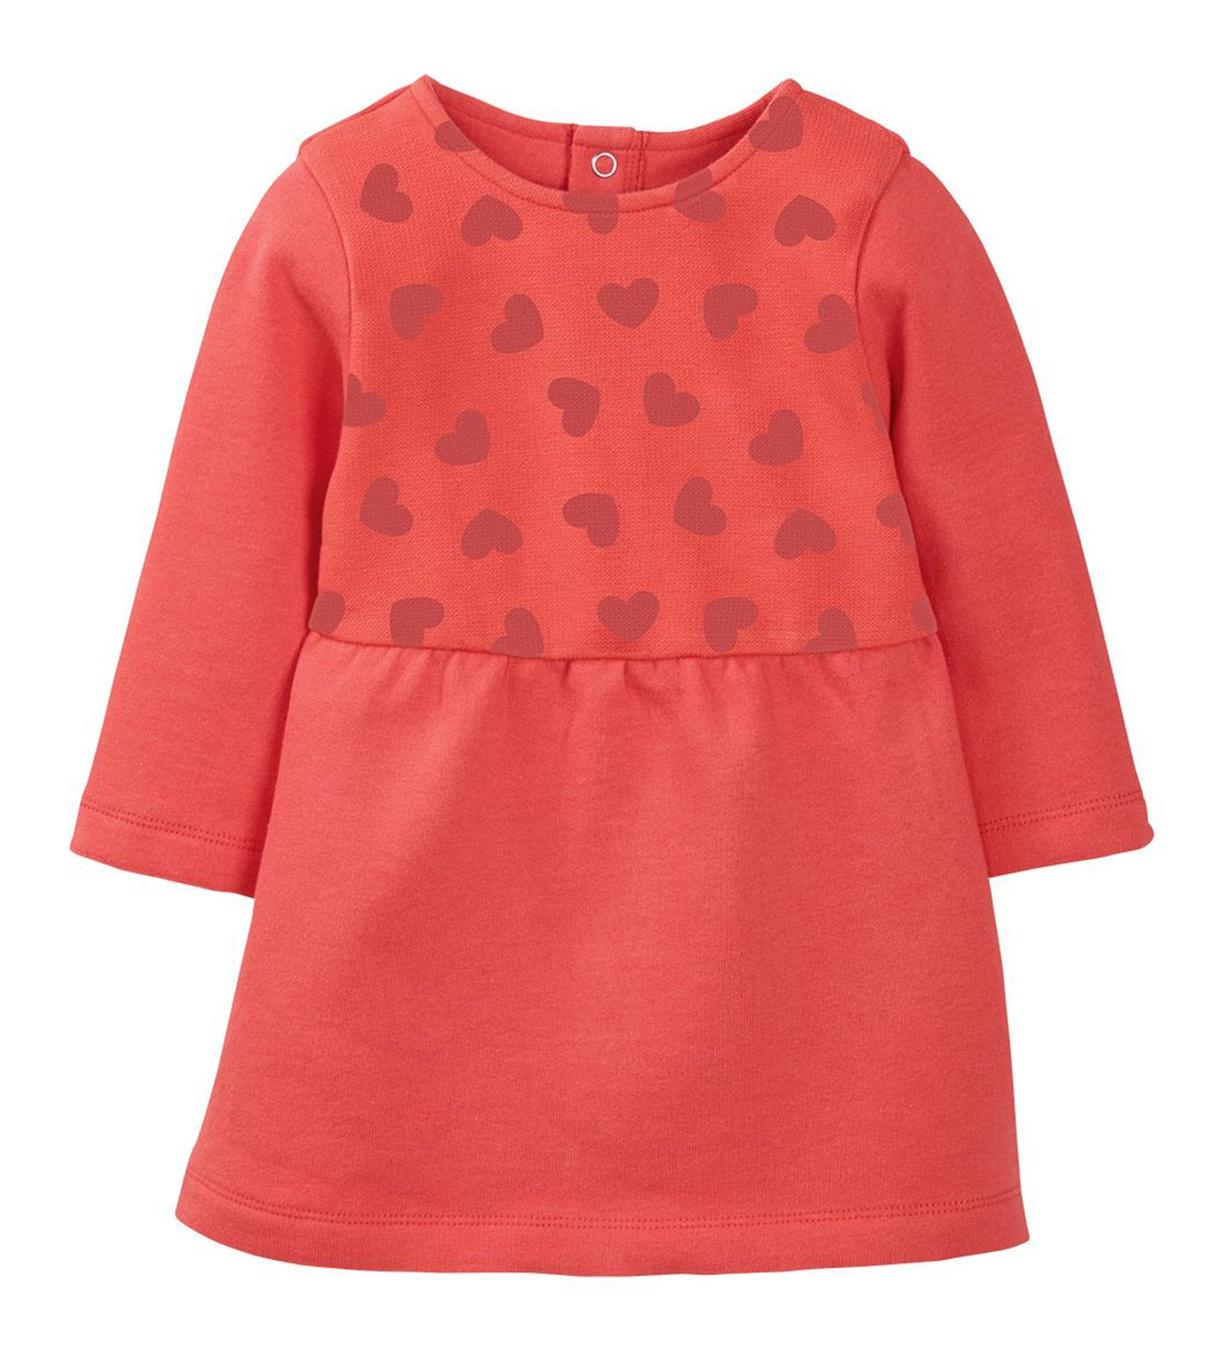 پیراهن دخترانه لوپیلو مدل b204